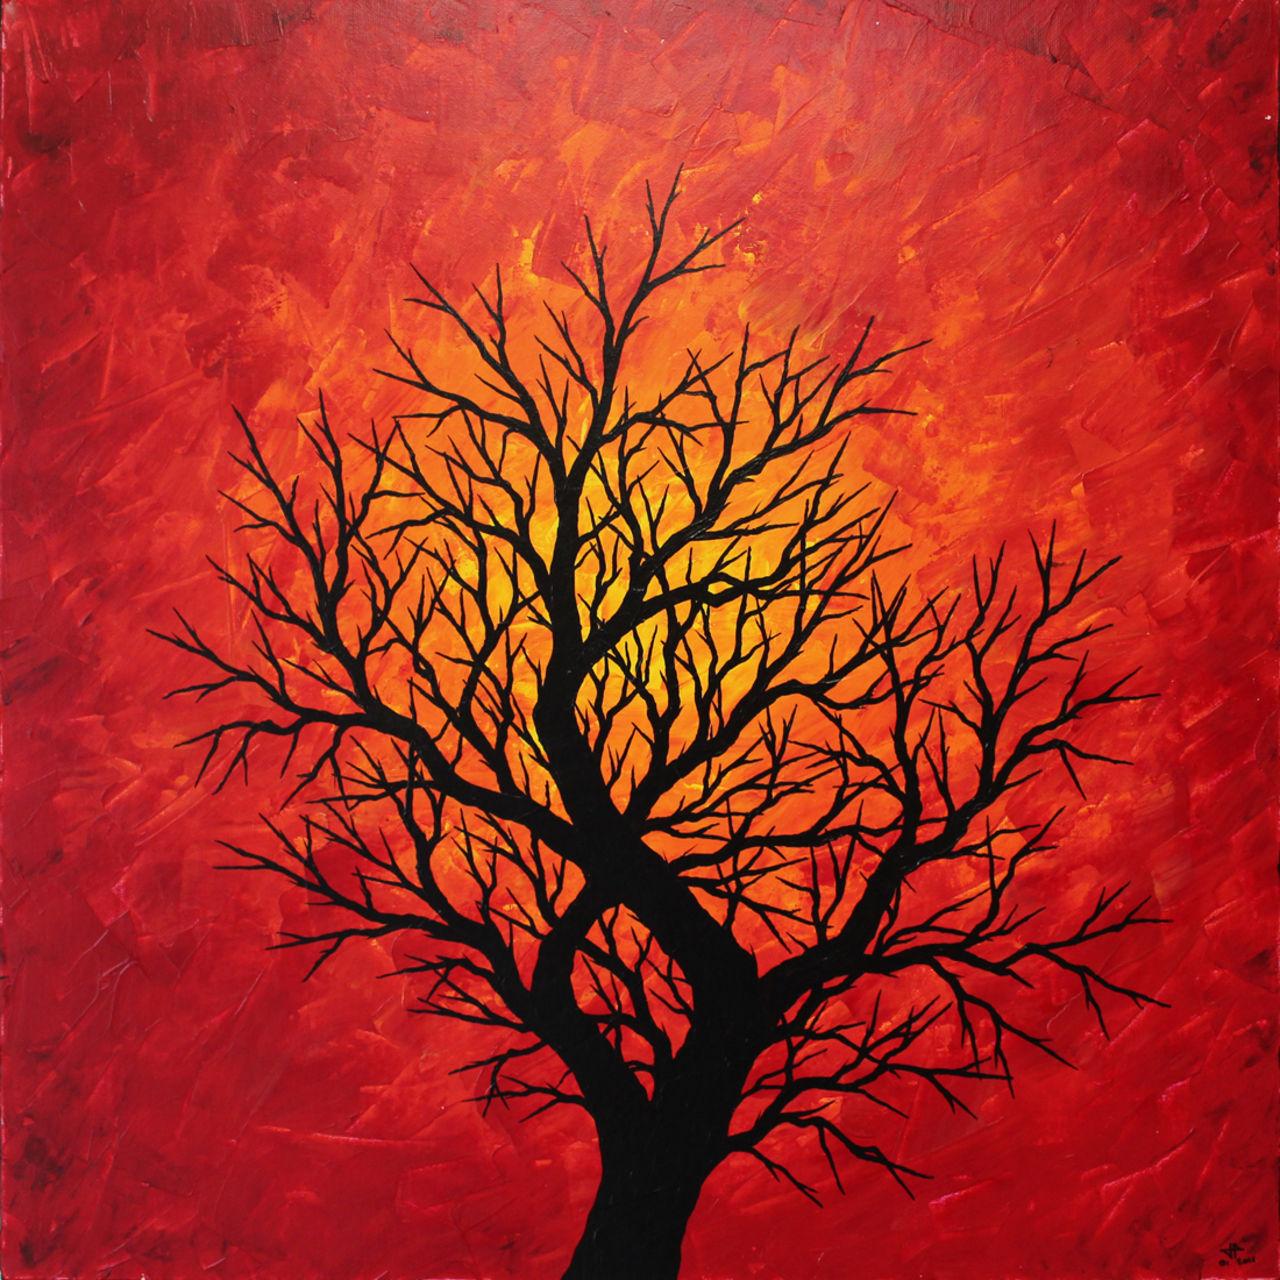 Jonathan-Pradillon Silhouette d'arbre chaleureux